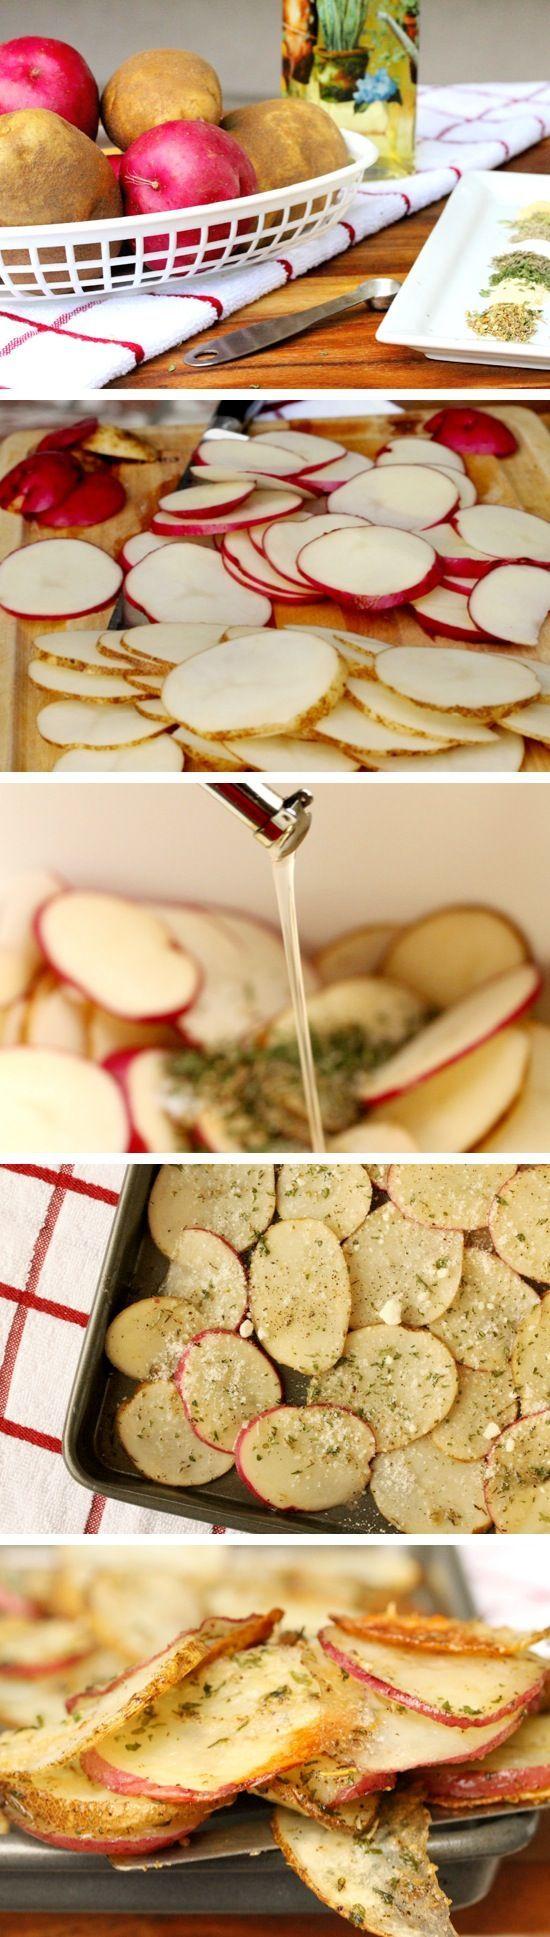 Baked Herb & Parmesan Potato Slices #food #drink #recipes